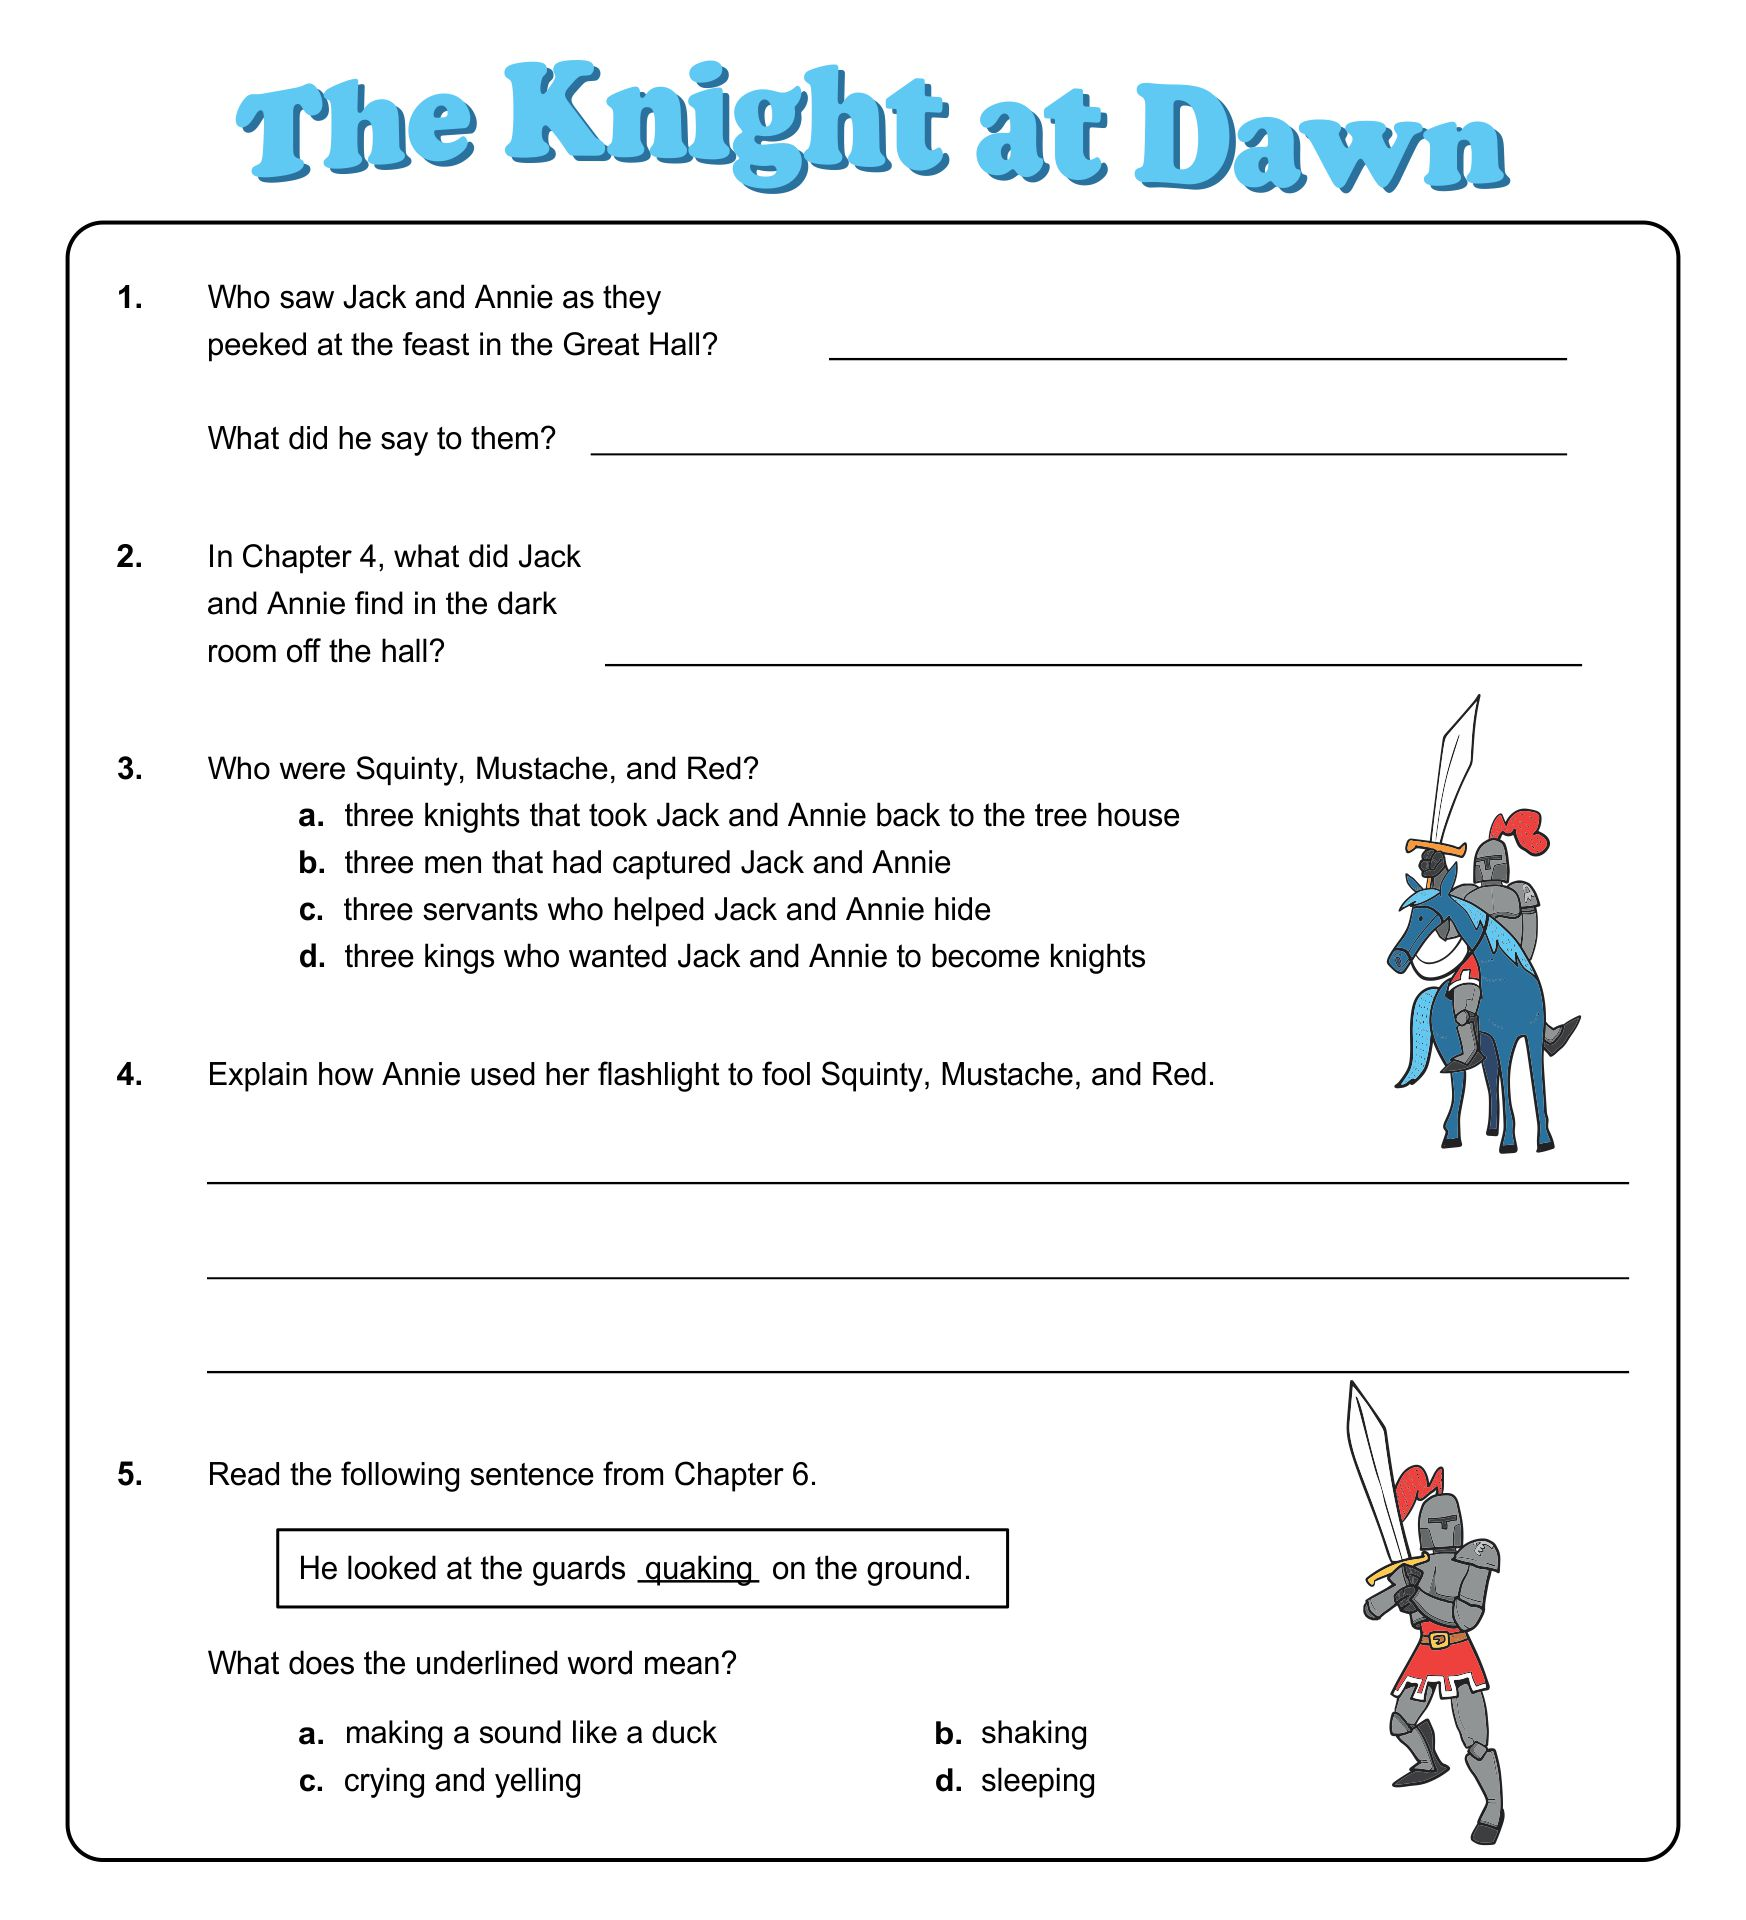 Magic Tree House Knight at Dawn Activities